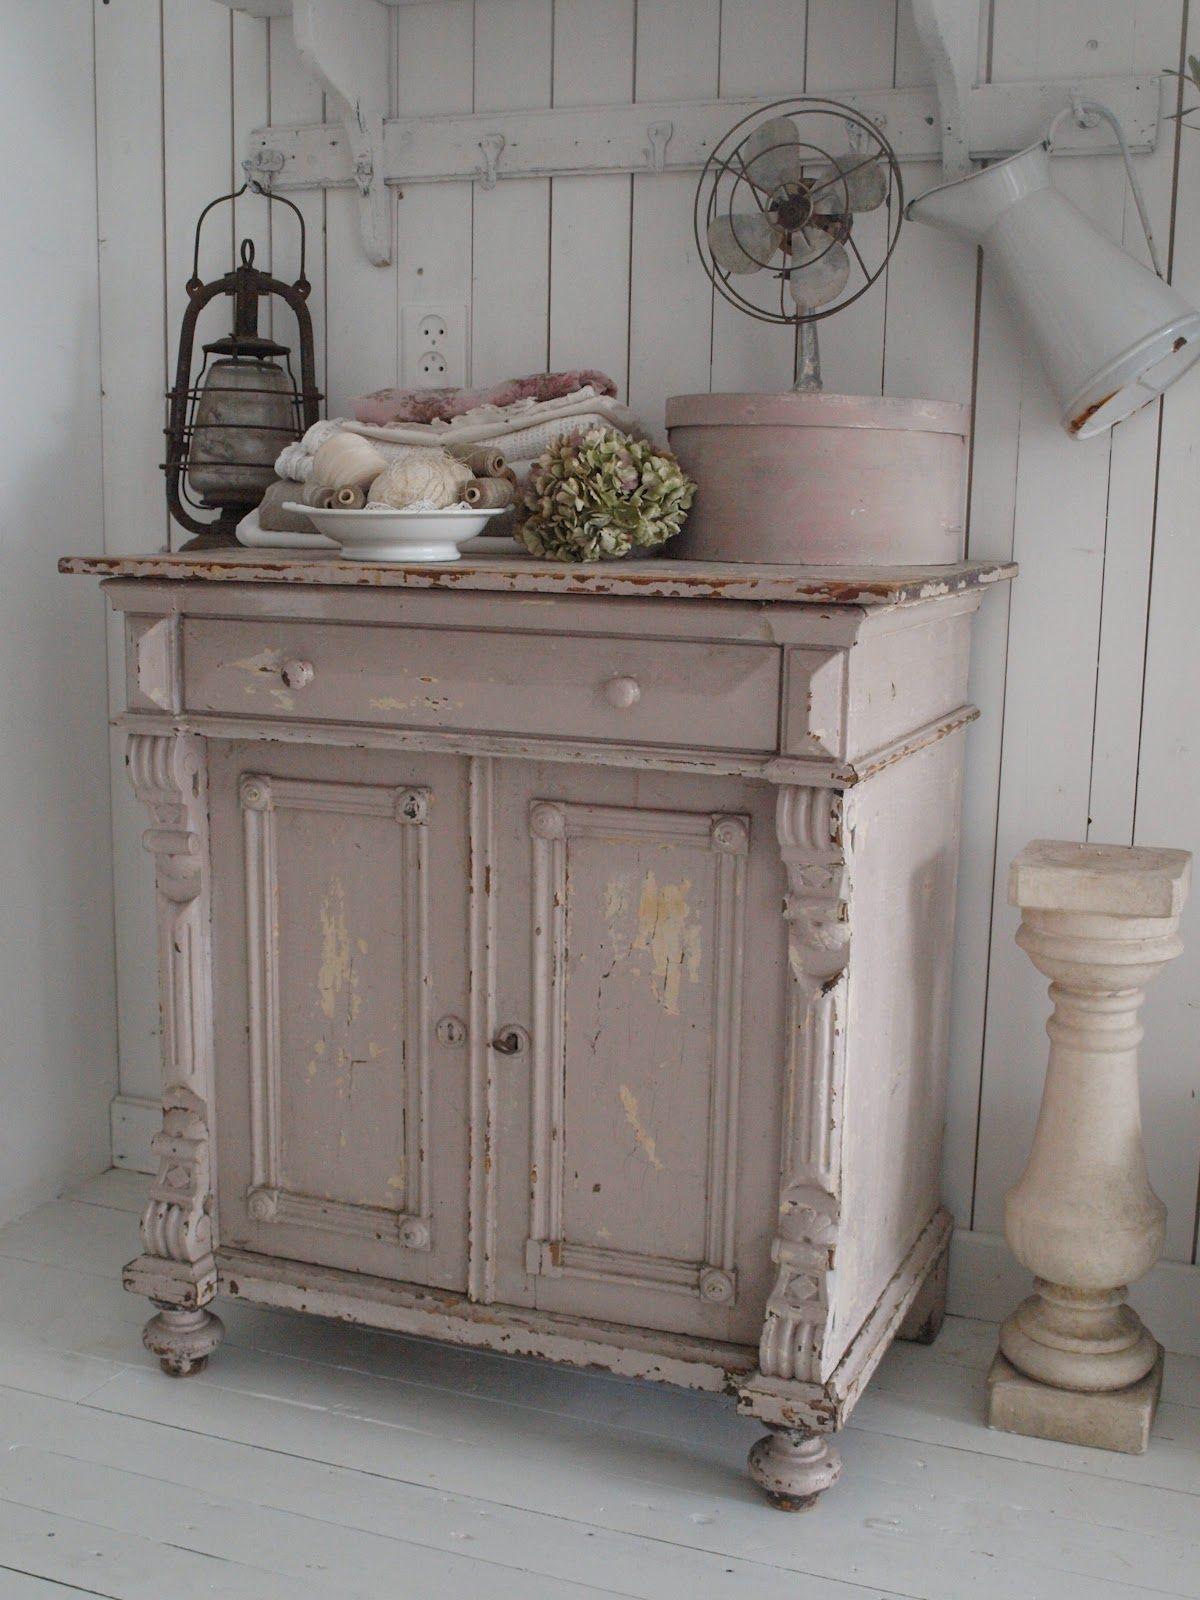 lichtroze oudroze paars beschilderde meubels vintage meubels shabby chic meubels opgeknapte meubels hergebruikte meubels brocante meubels